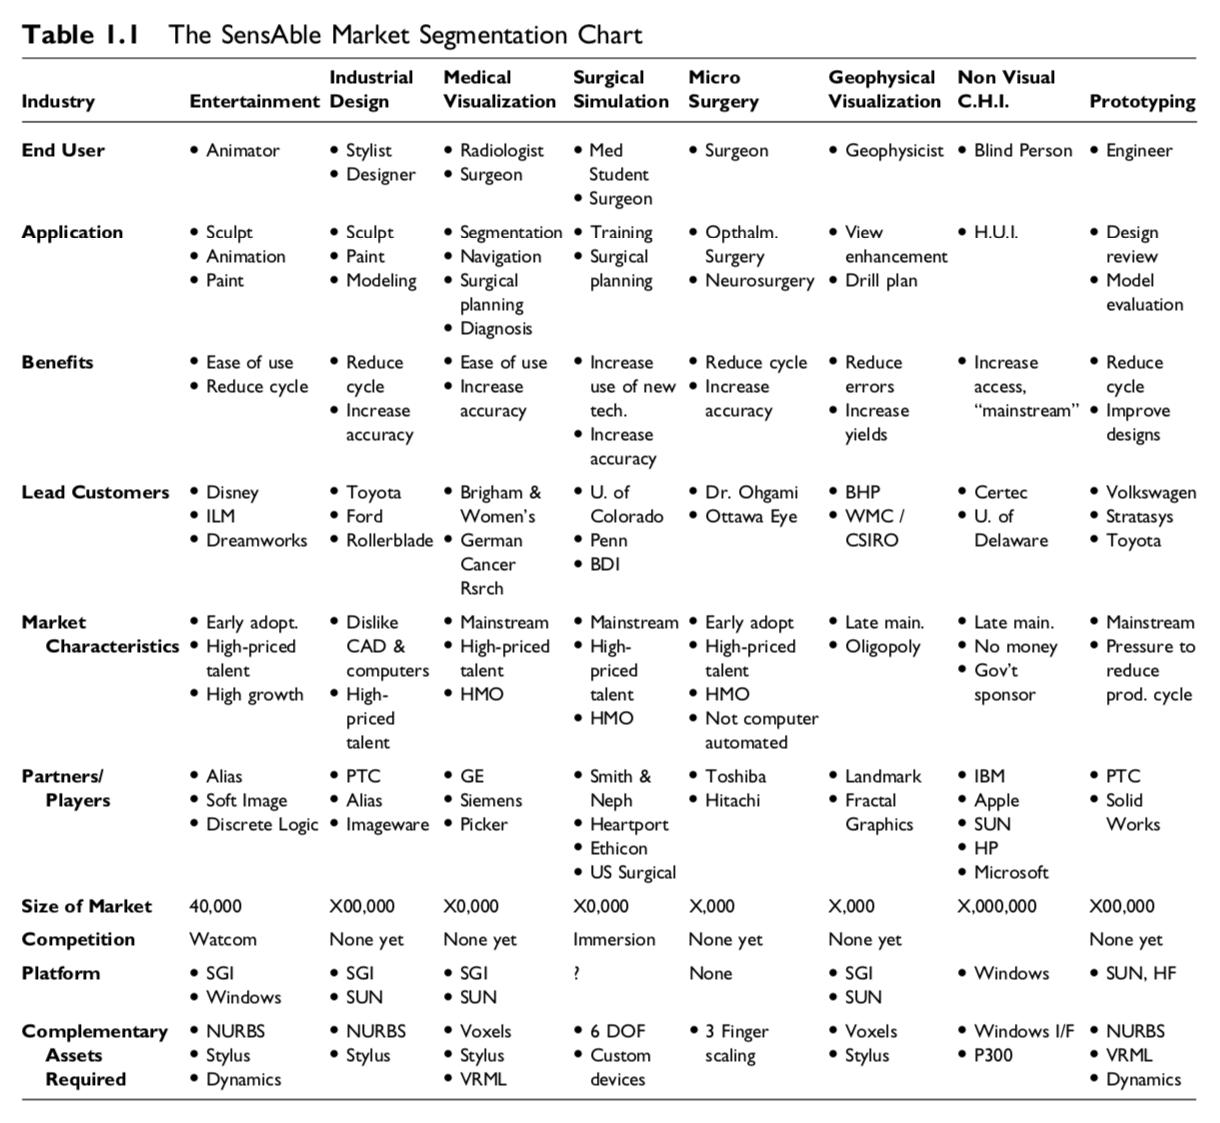 The SensAble Market Segmentation Chart